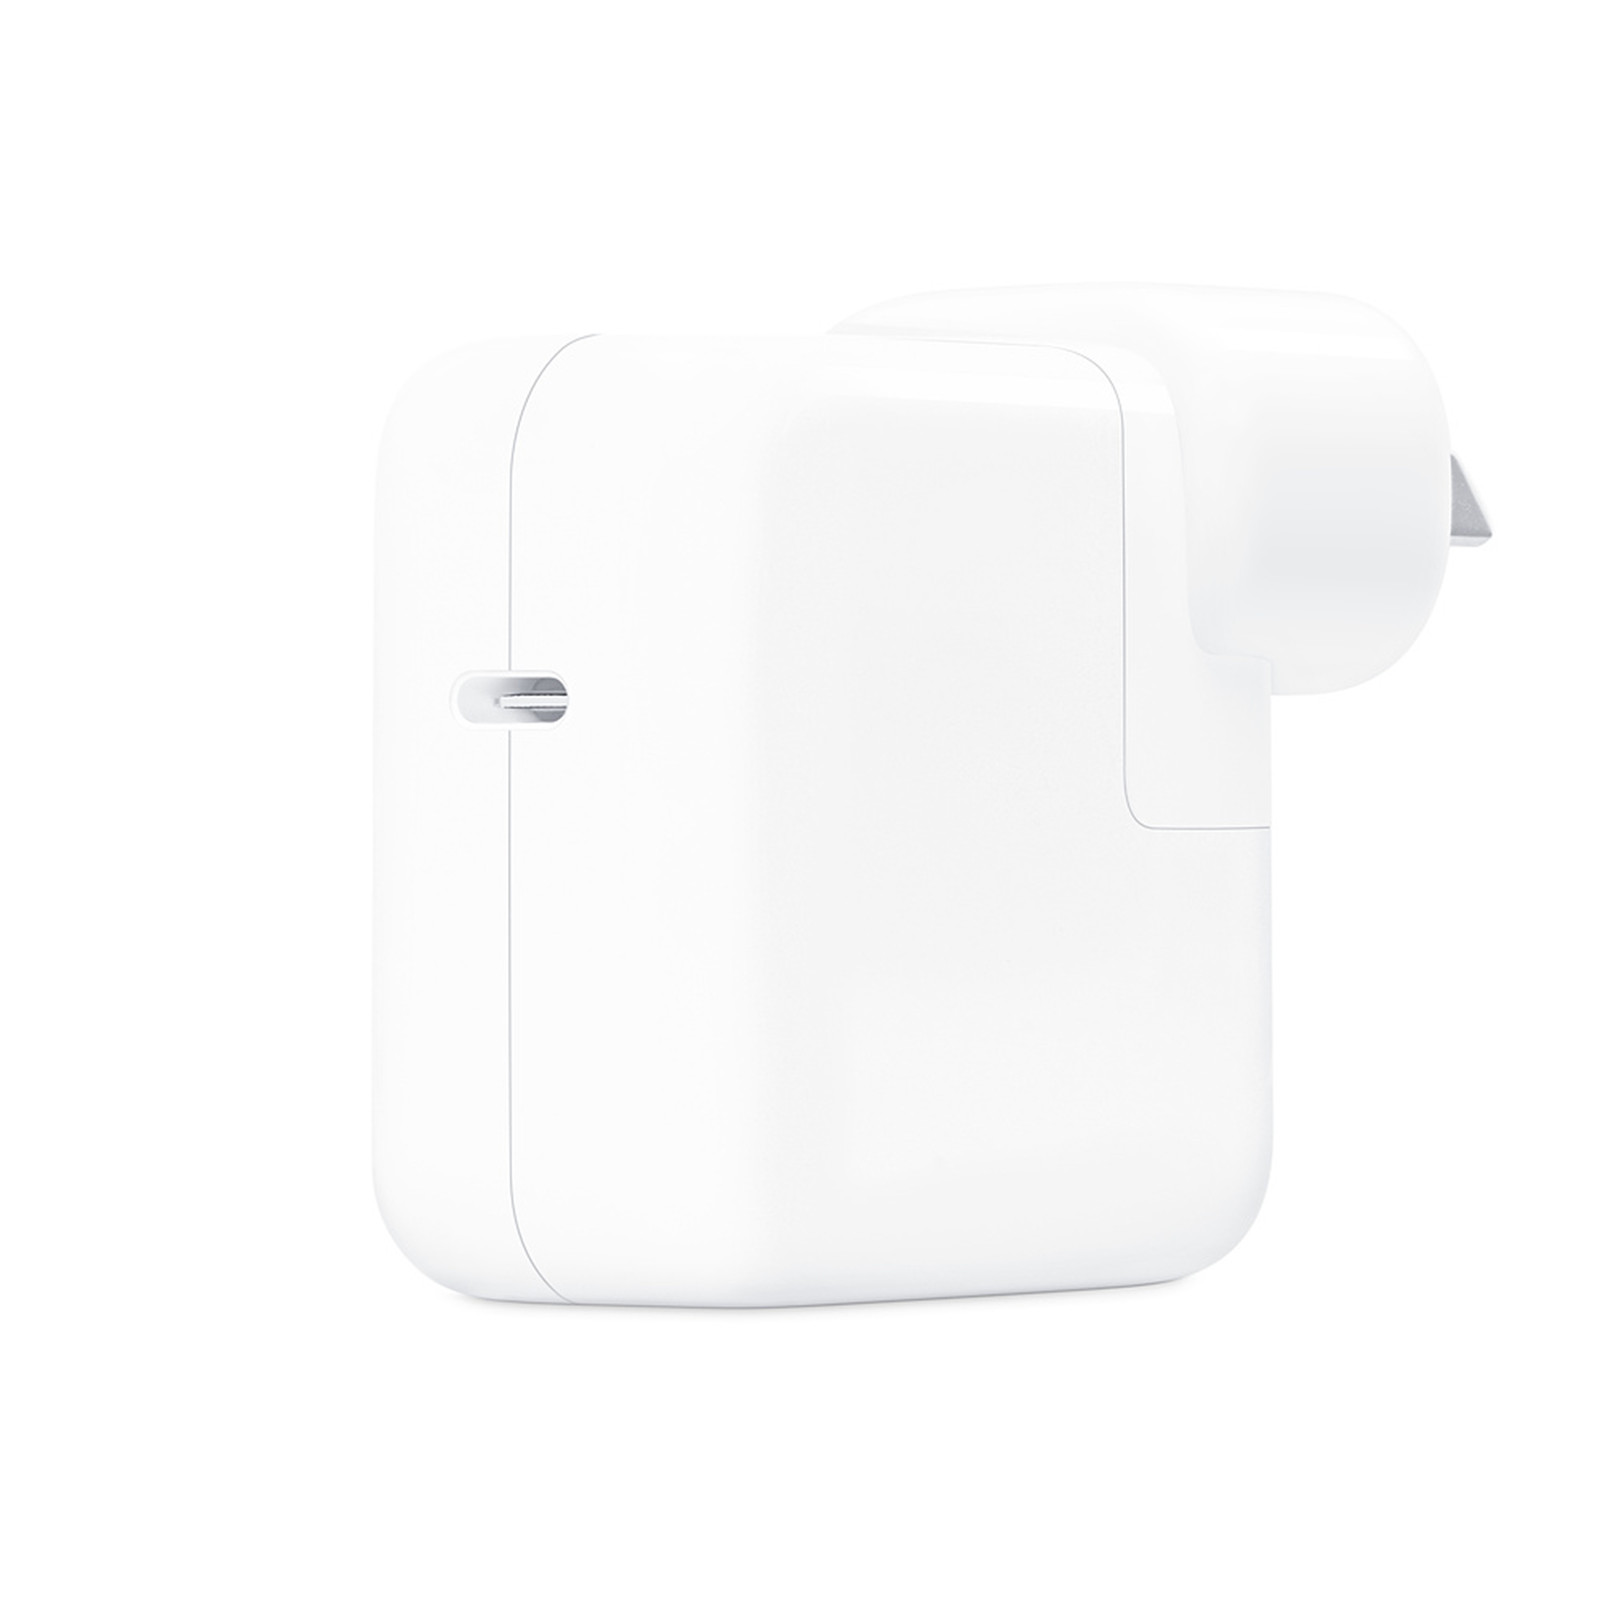 Apple 30W USB-C Power Adapter [MR2A2X/A]